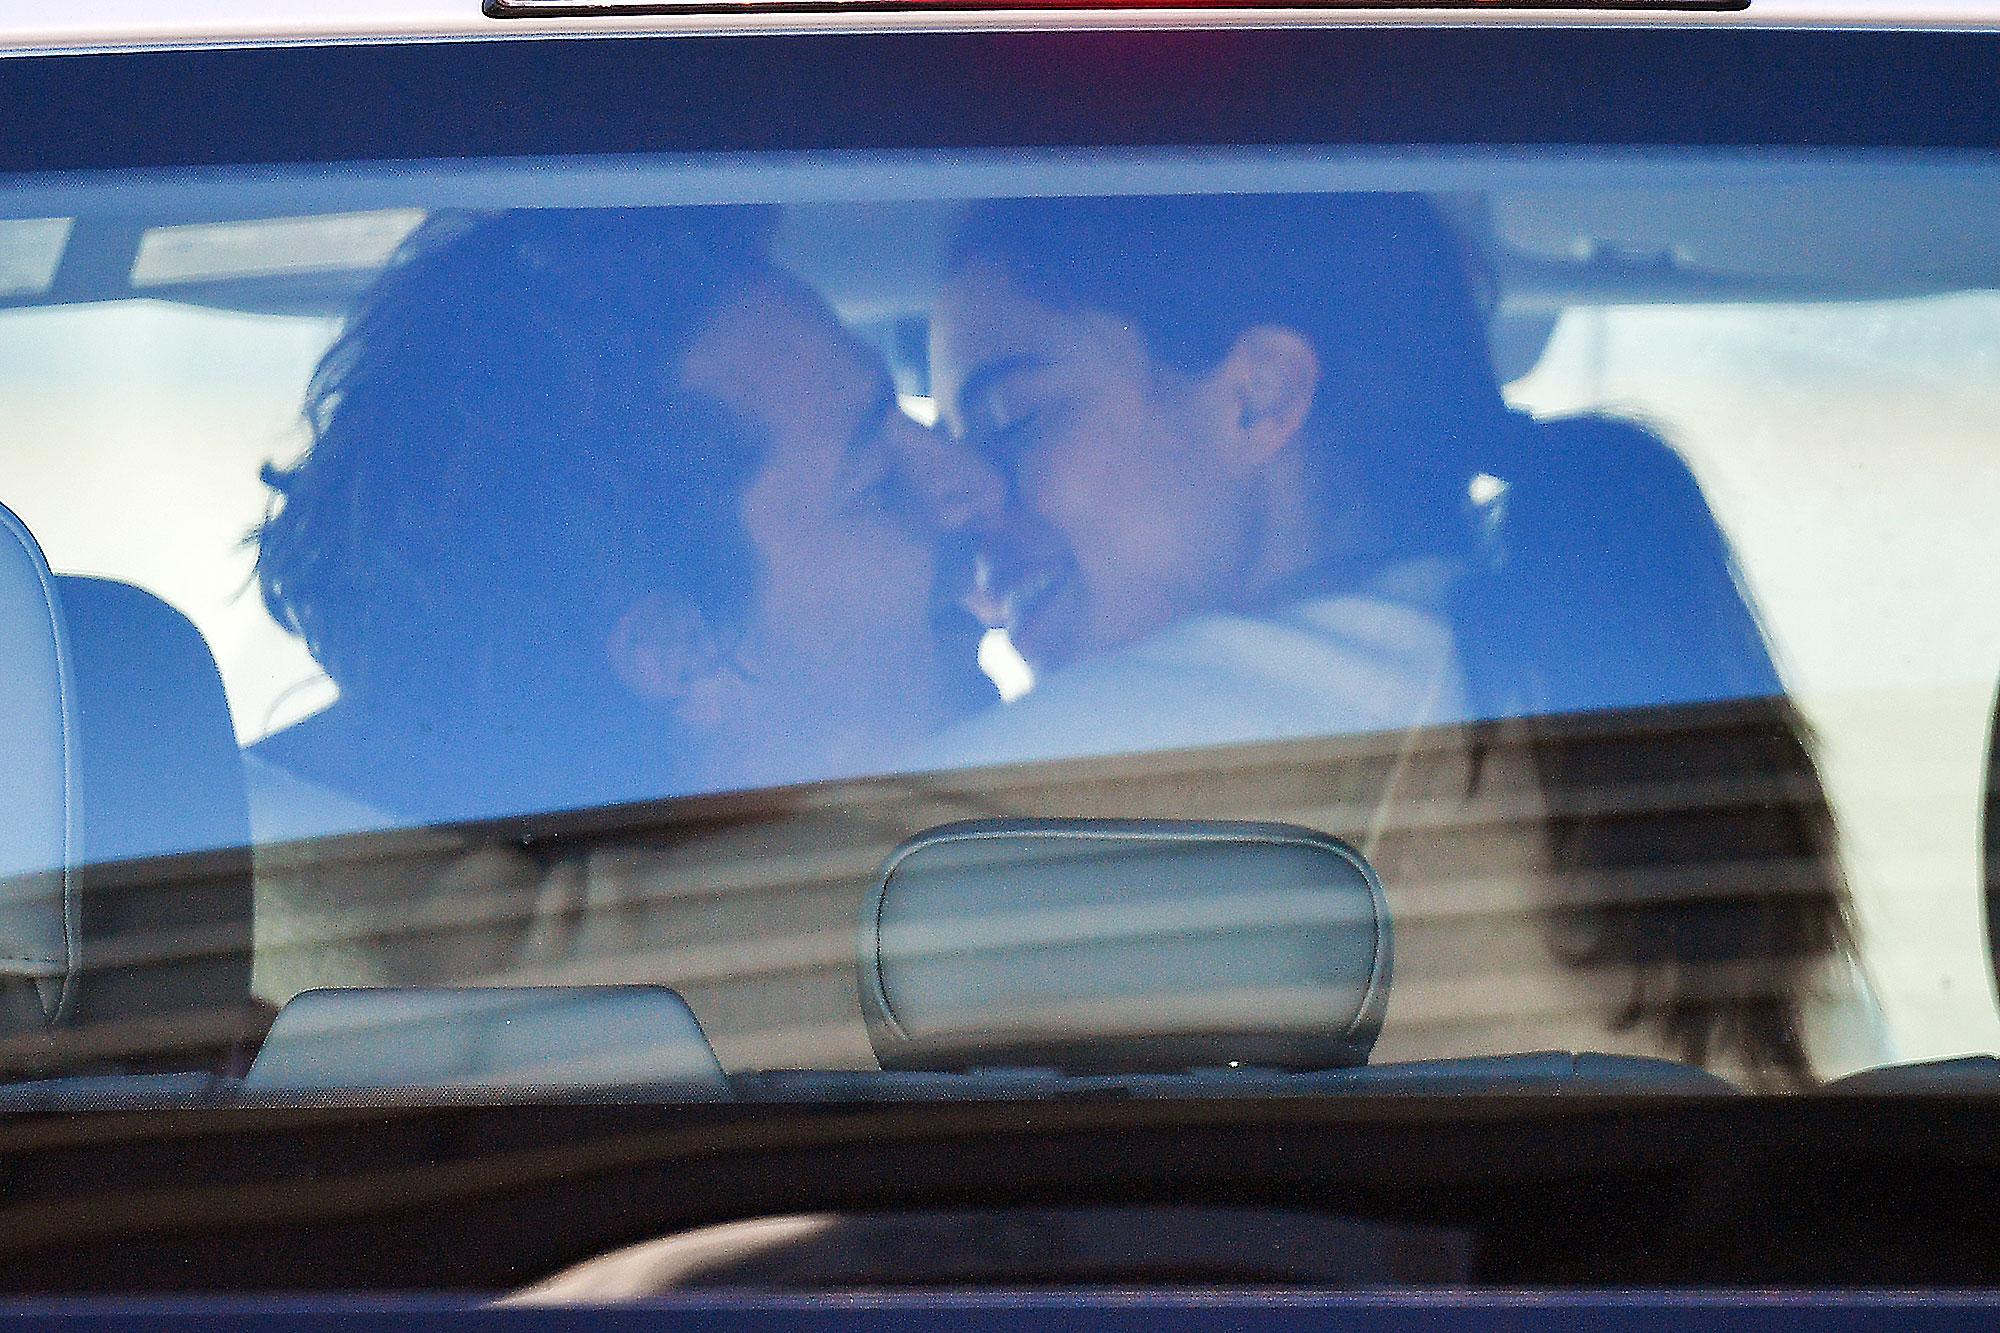 Shia LaBeouf Kisses Margaret Qualley Amid FKA Twigs Abuse Lawsuit